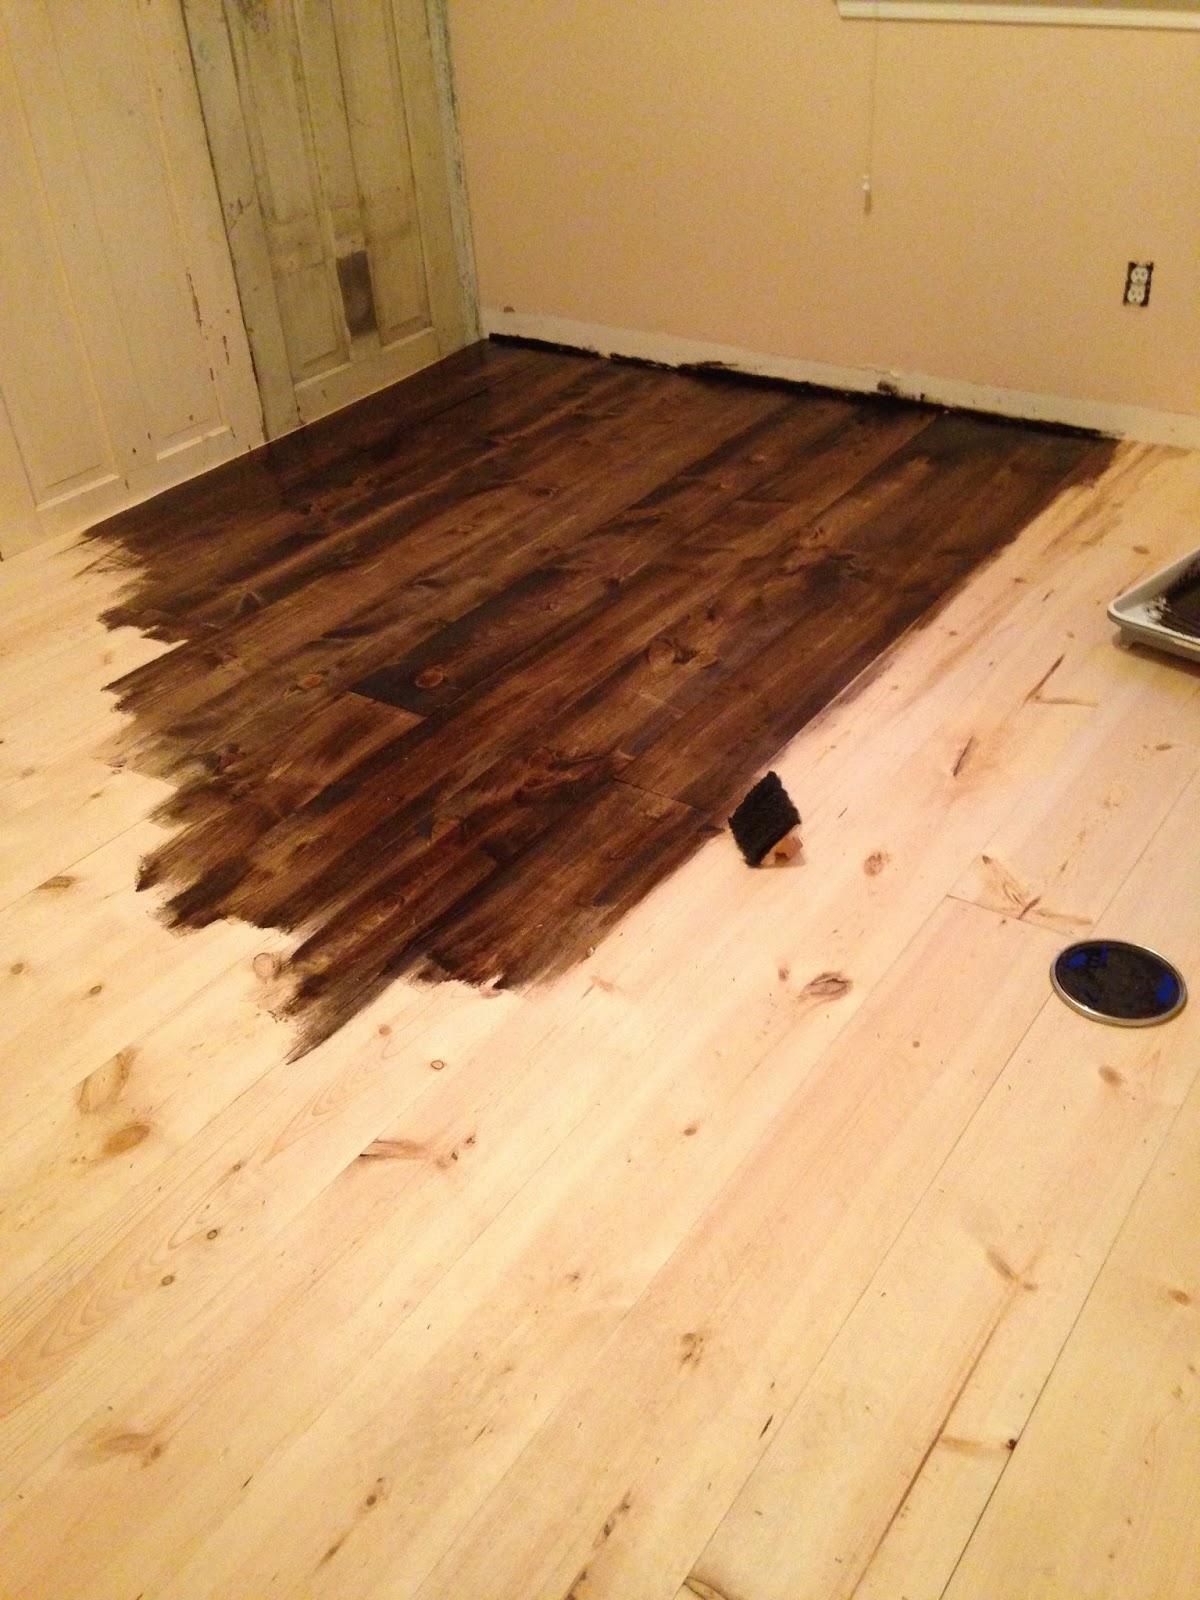 Grand Design: DIY pine plank wood flooring